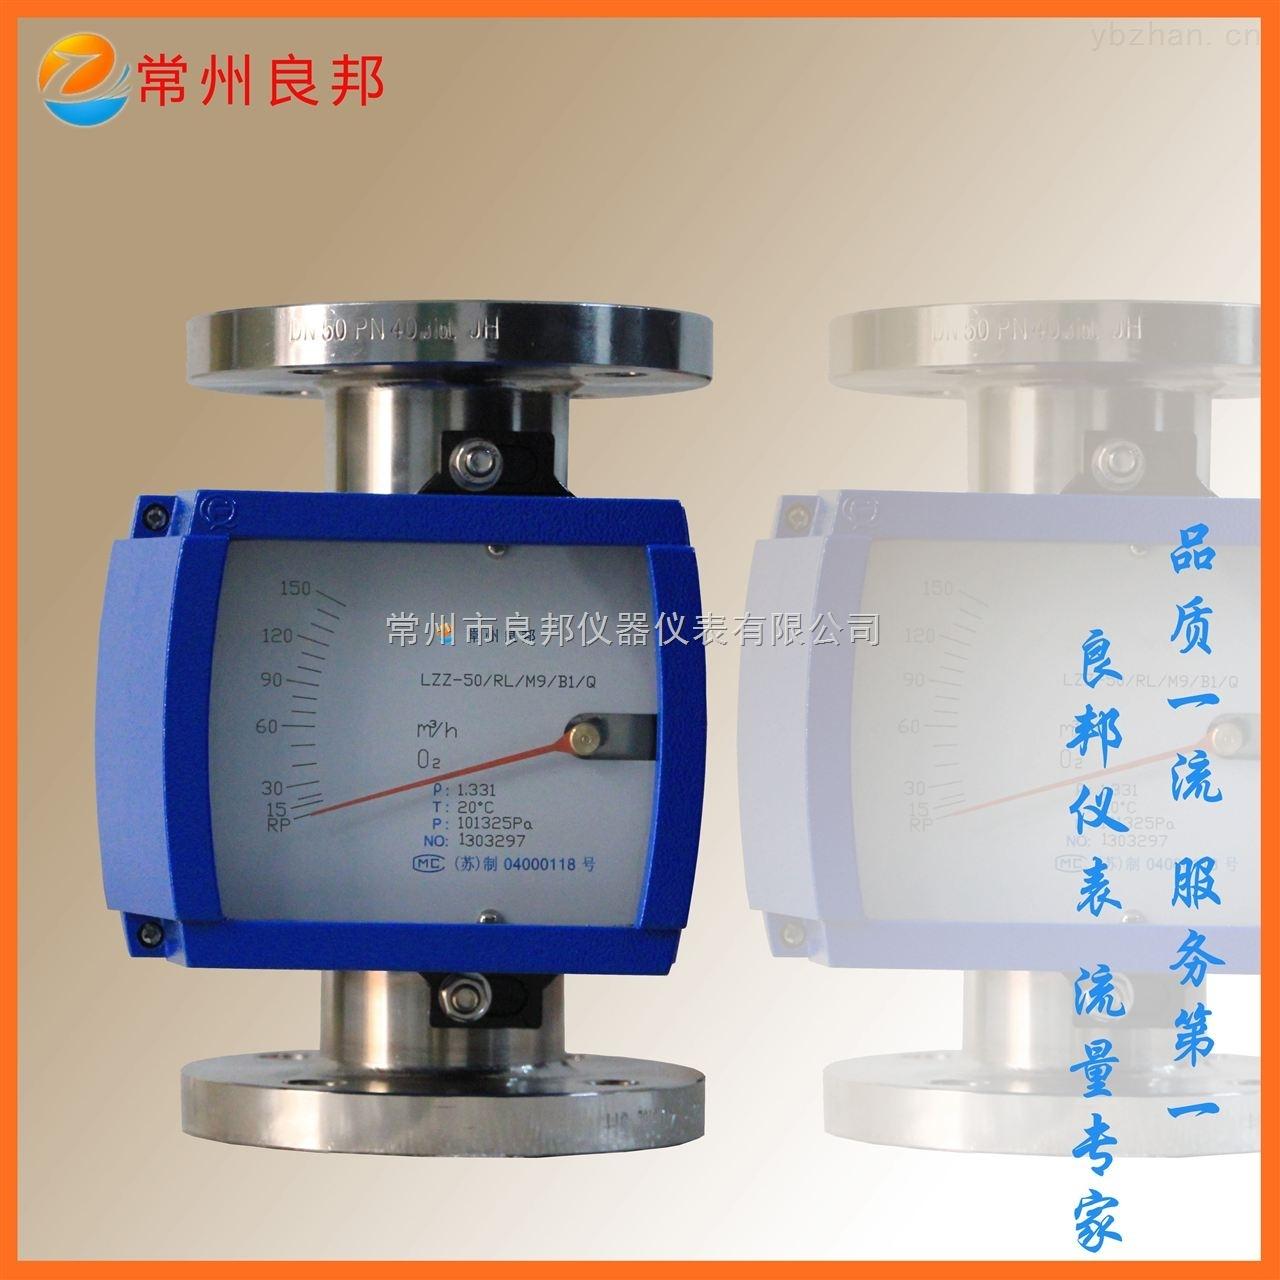 LZZ-65-常州不锈钢金属管浮子流量计LZZ-65【良邦仪表】耐高压液体流量计